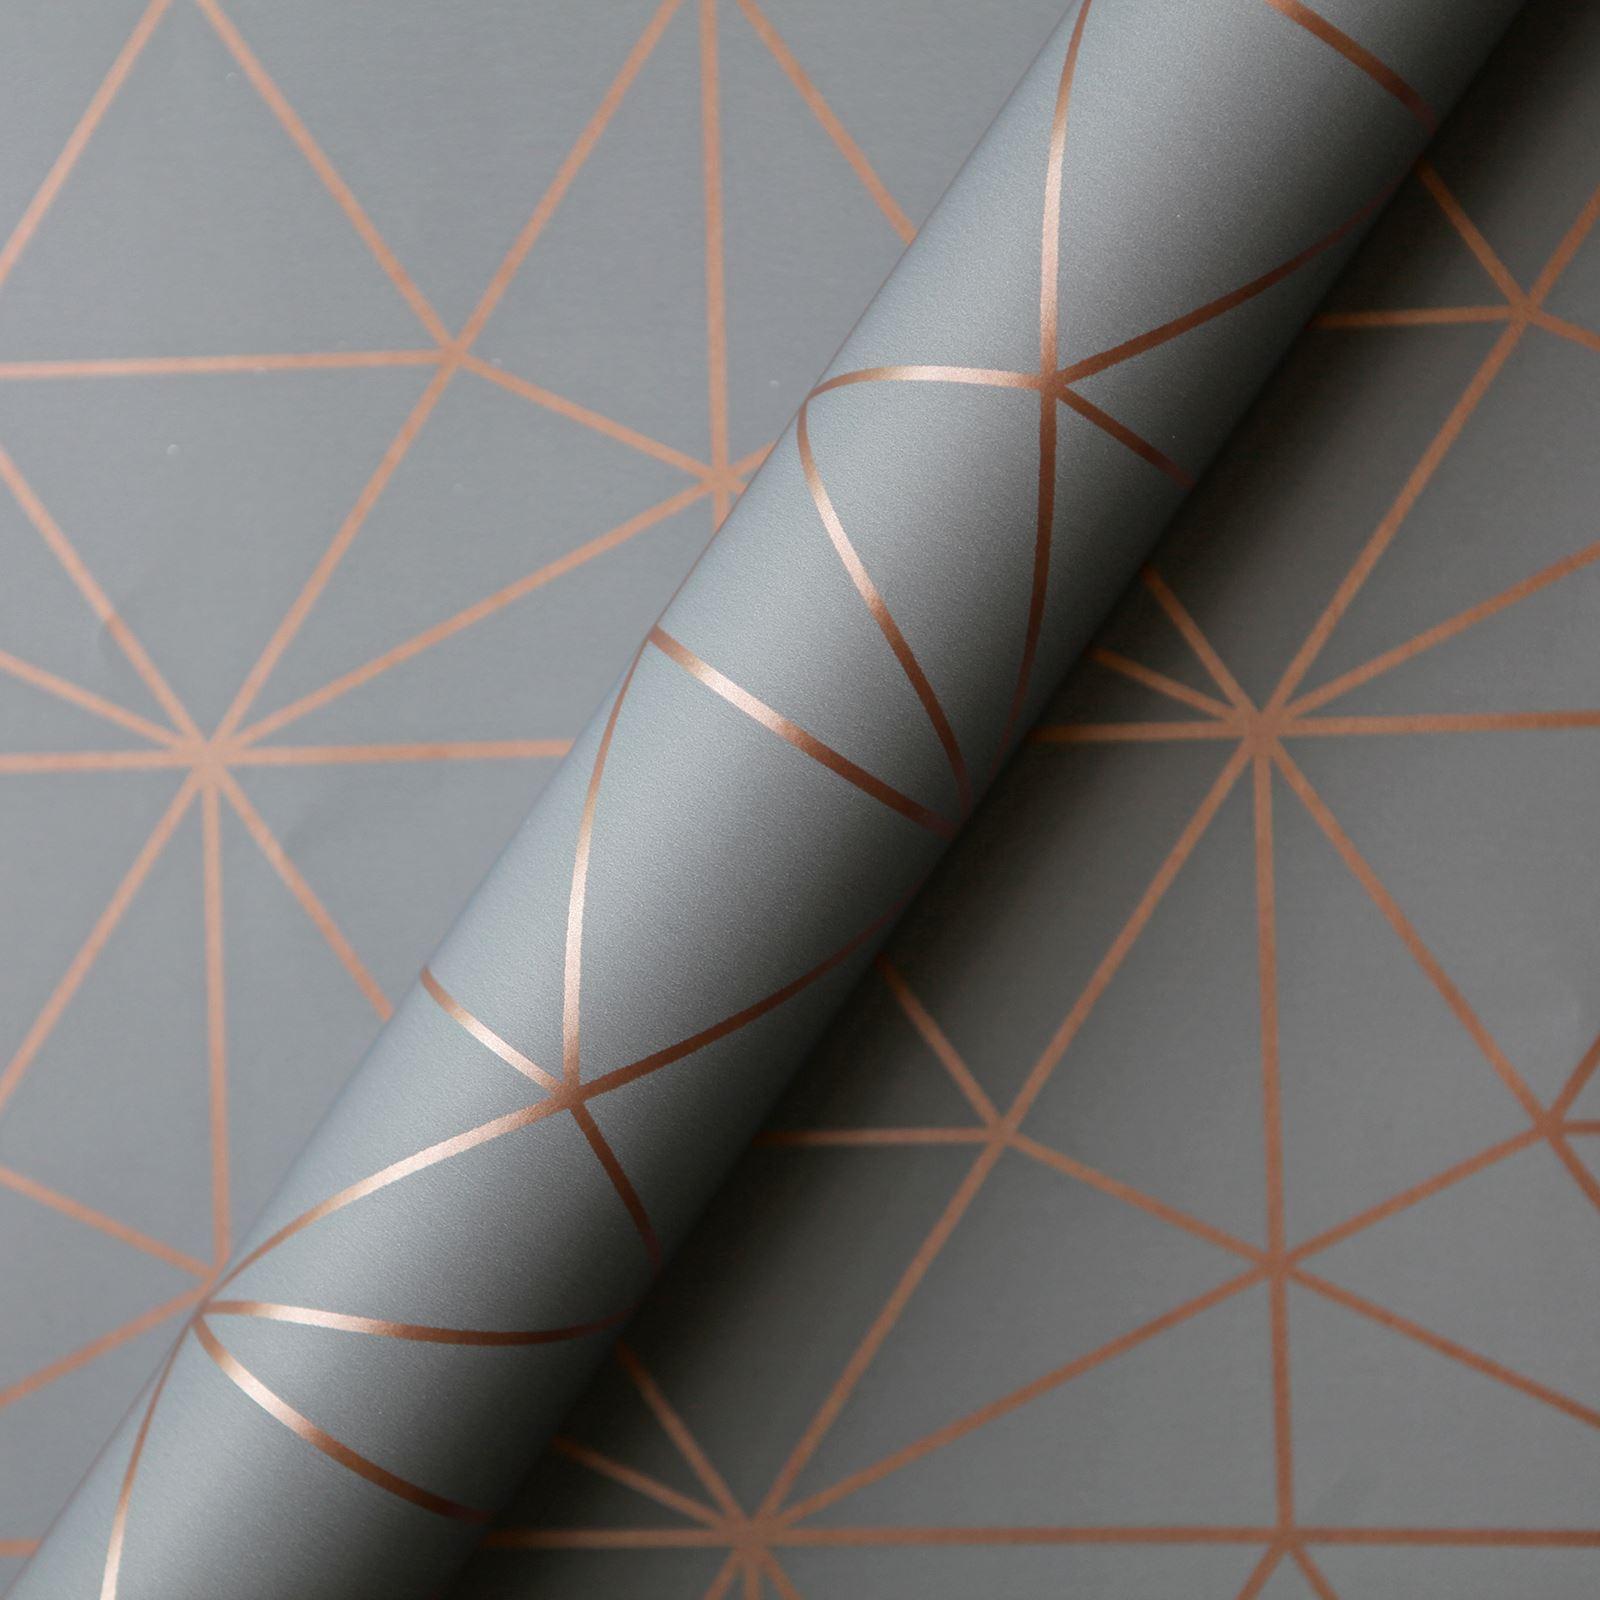 WORLD-OF-WALLPAPER-METRO-PRISM-TRIANGLE-GEOMETRIC-METALLIC-ROSE-GOLD-COPPER thumbnail 5